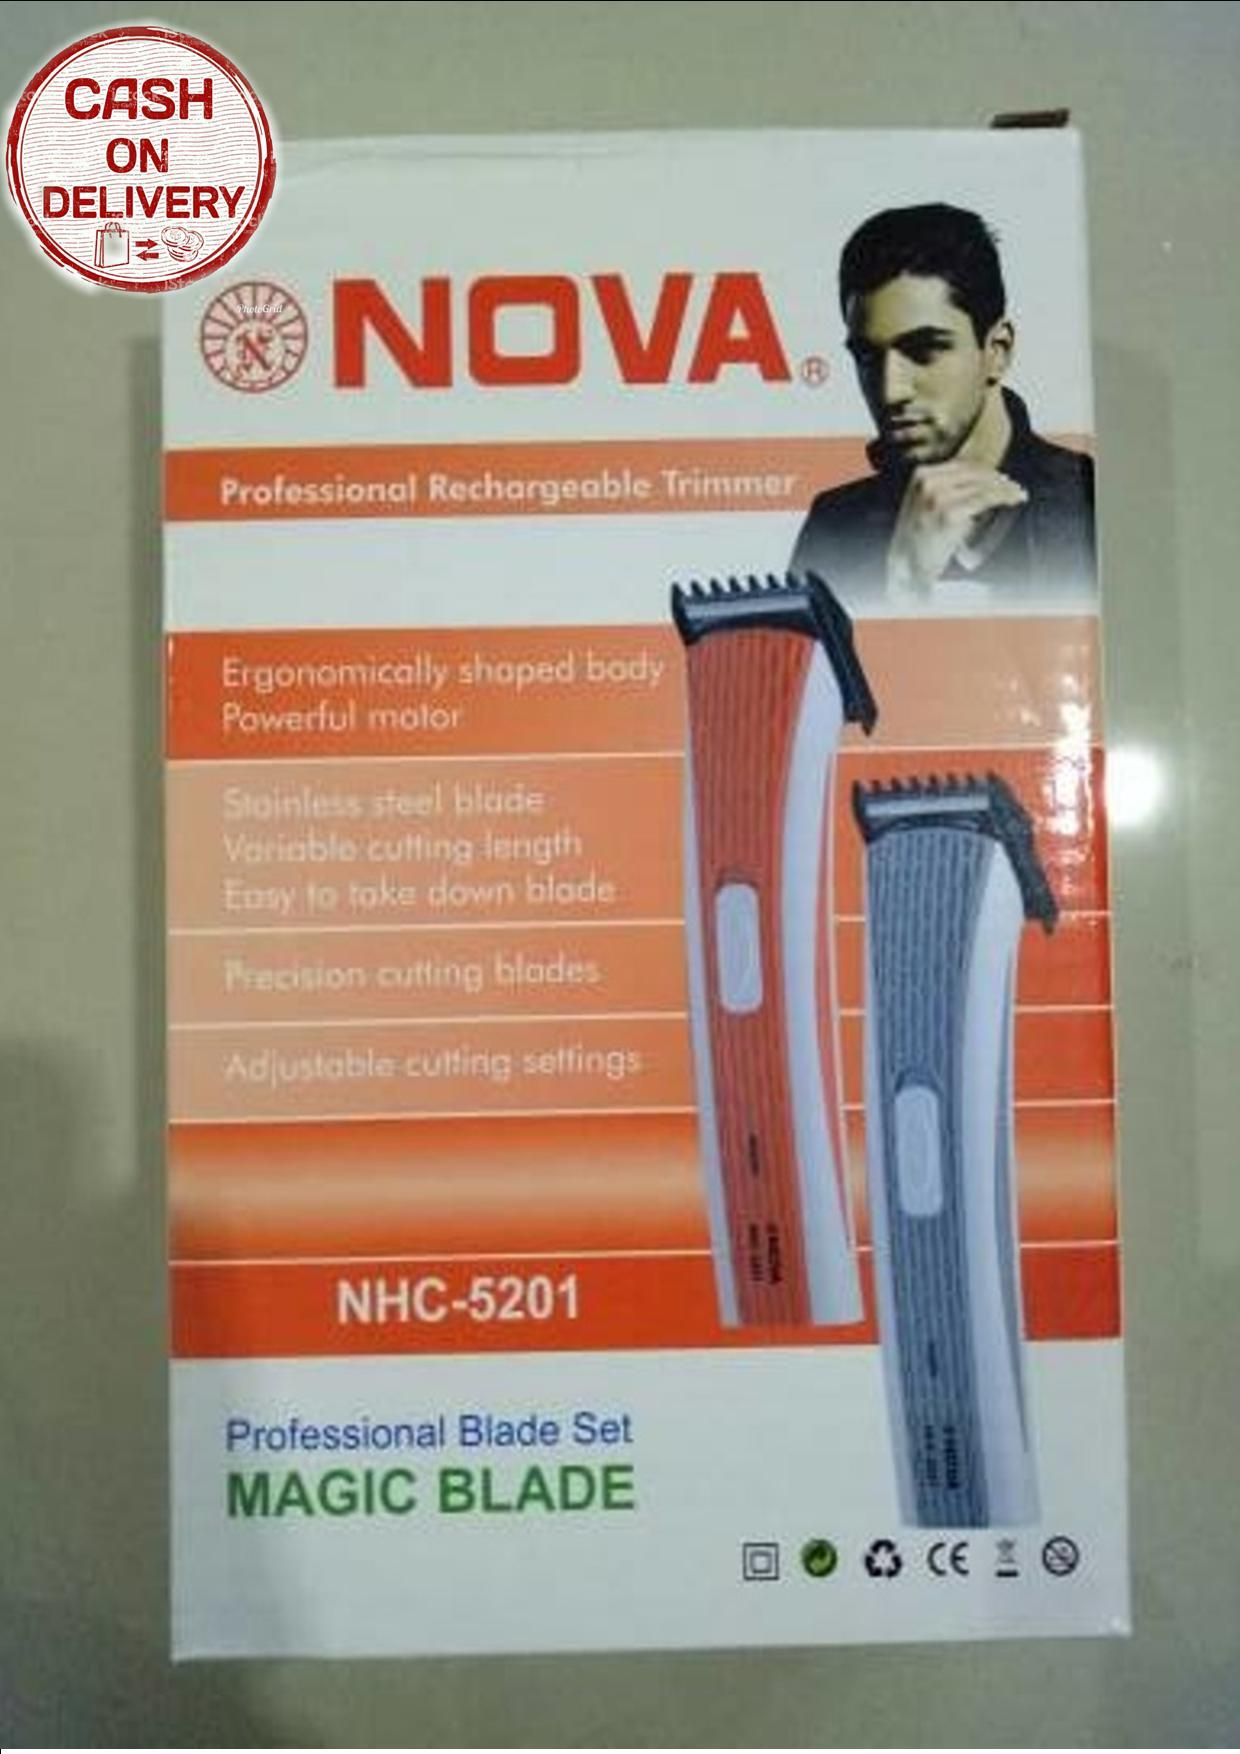 Daftar Harga Alat Cukur Rambut Murah Terupdate 2018 Bhinekashop Potong Mitsuyama Ms 5019 Sien Collection Nova Nhc 5201 Clipper